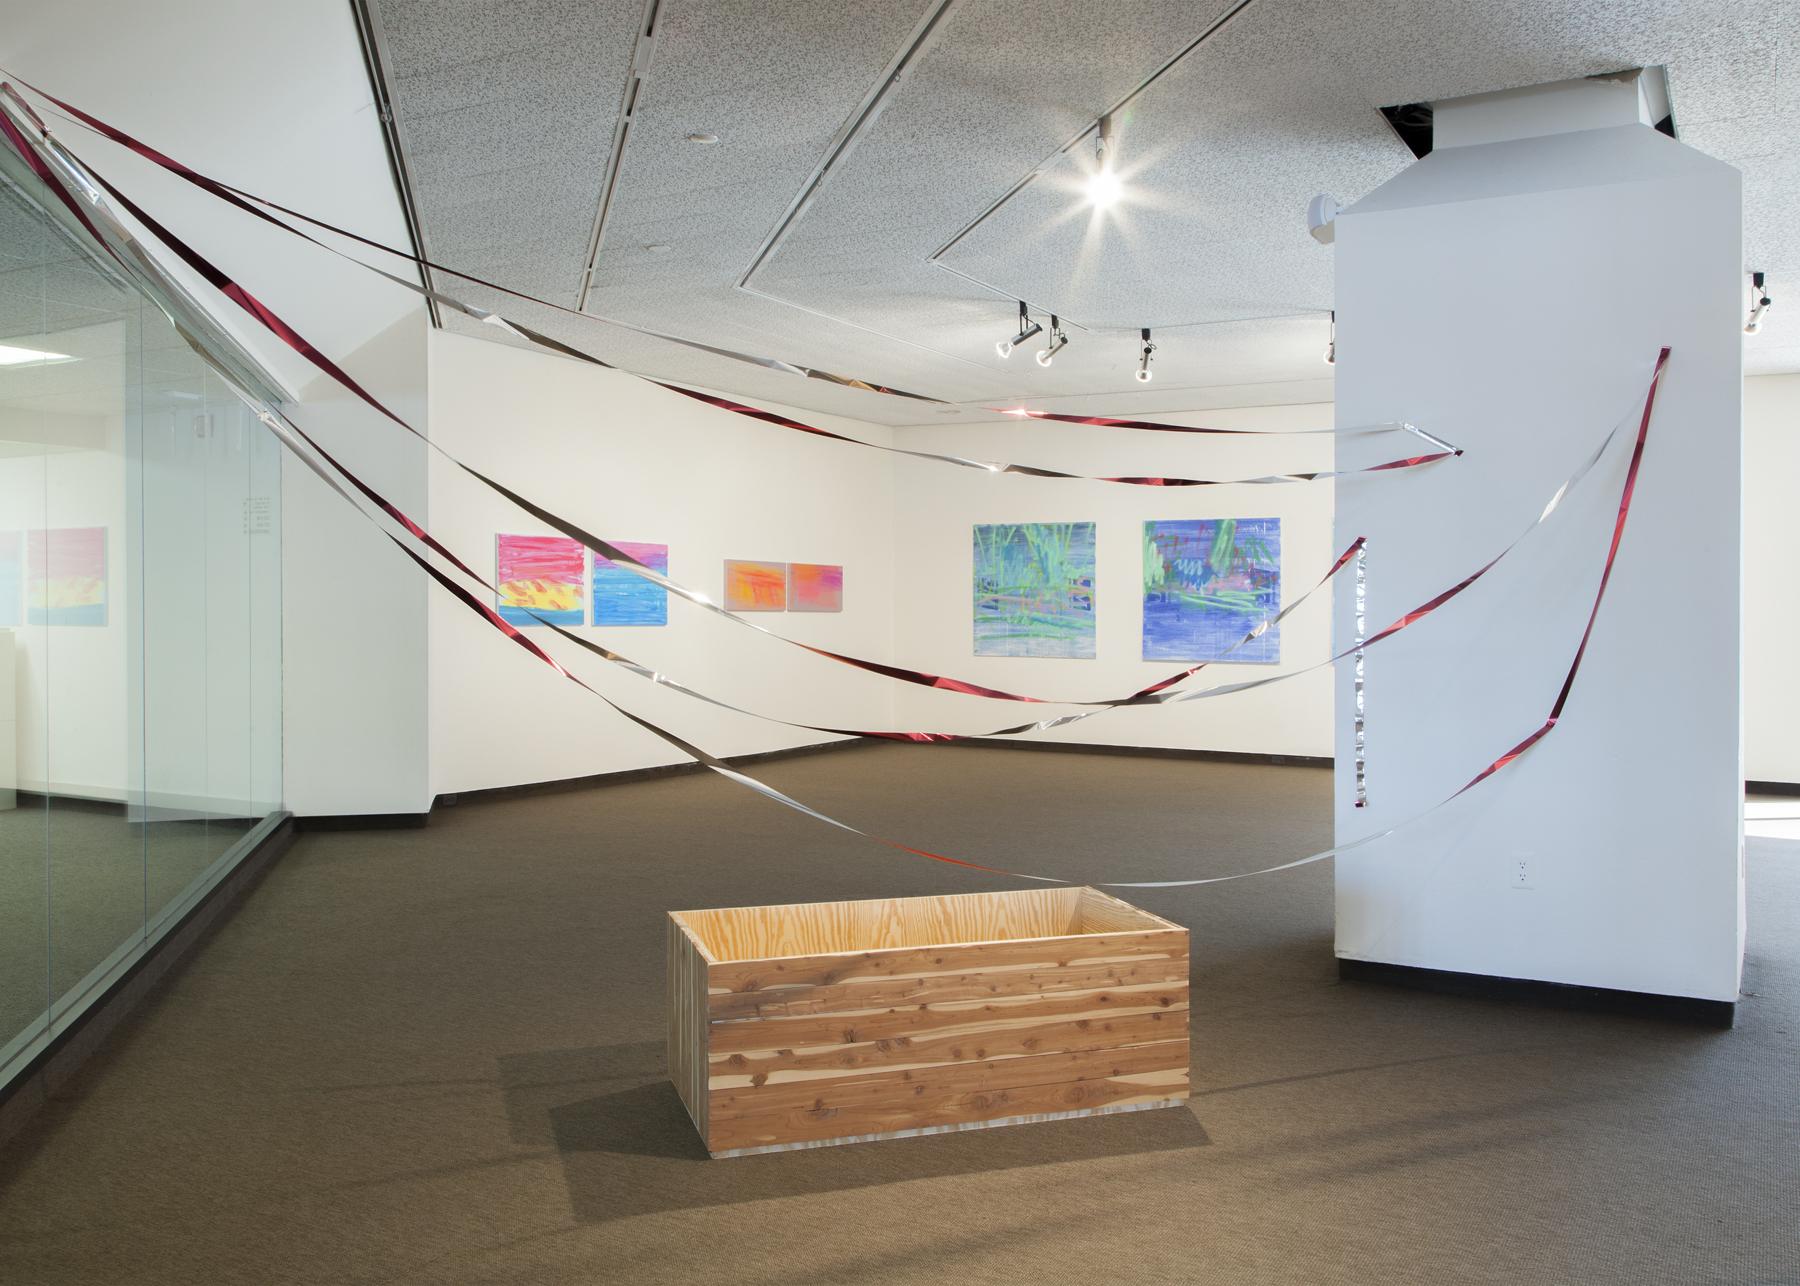 Talisman Against Endless Growth   Cedar, plywood, bird tape. 2015.